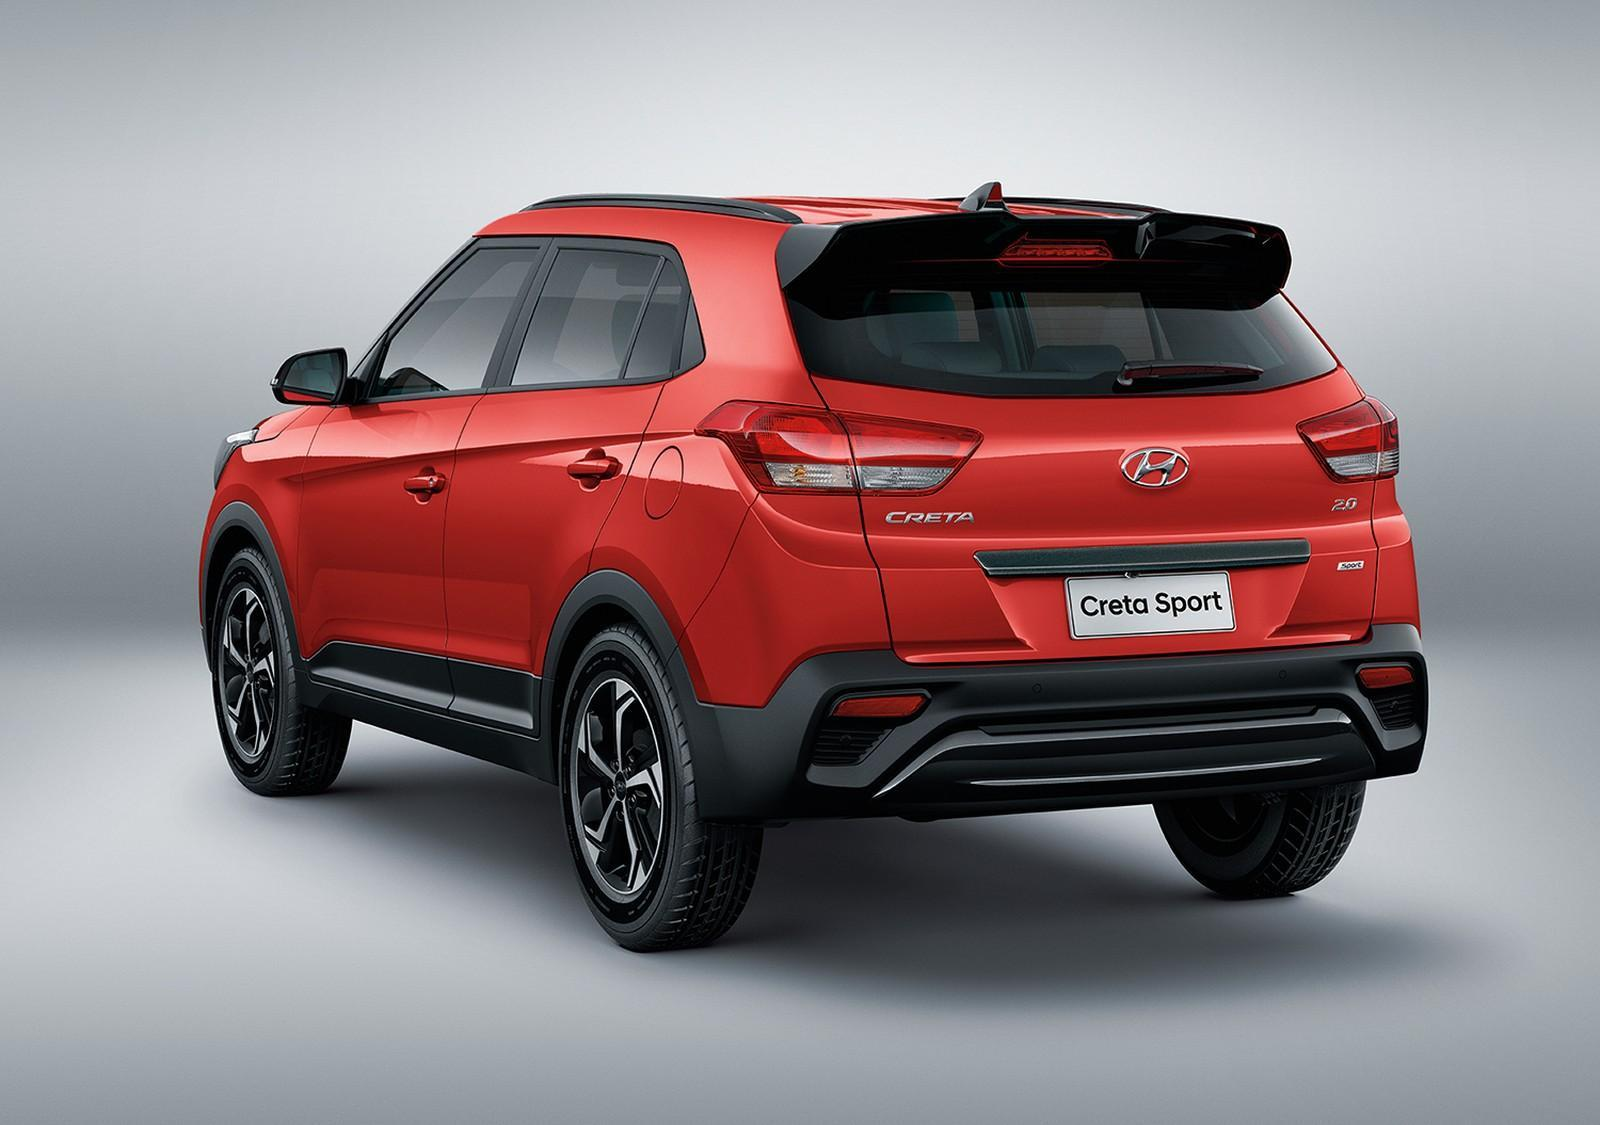 Hyundai Creta 2019 Sport